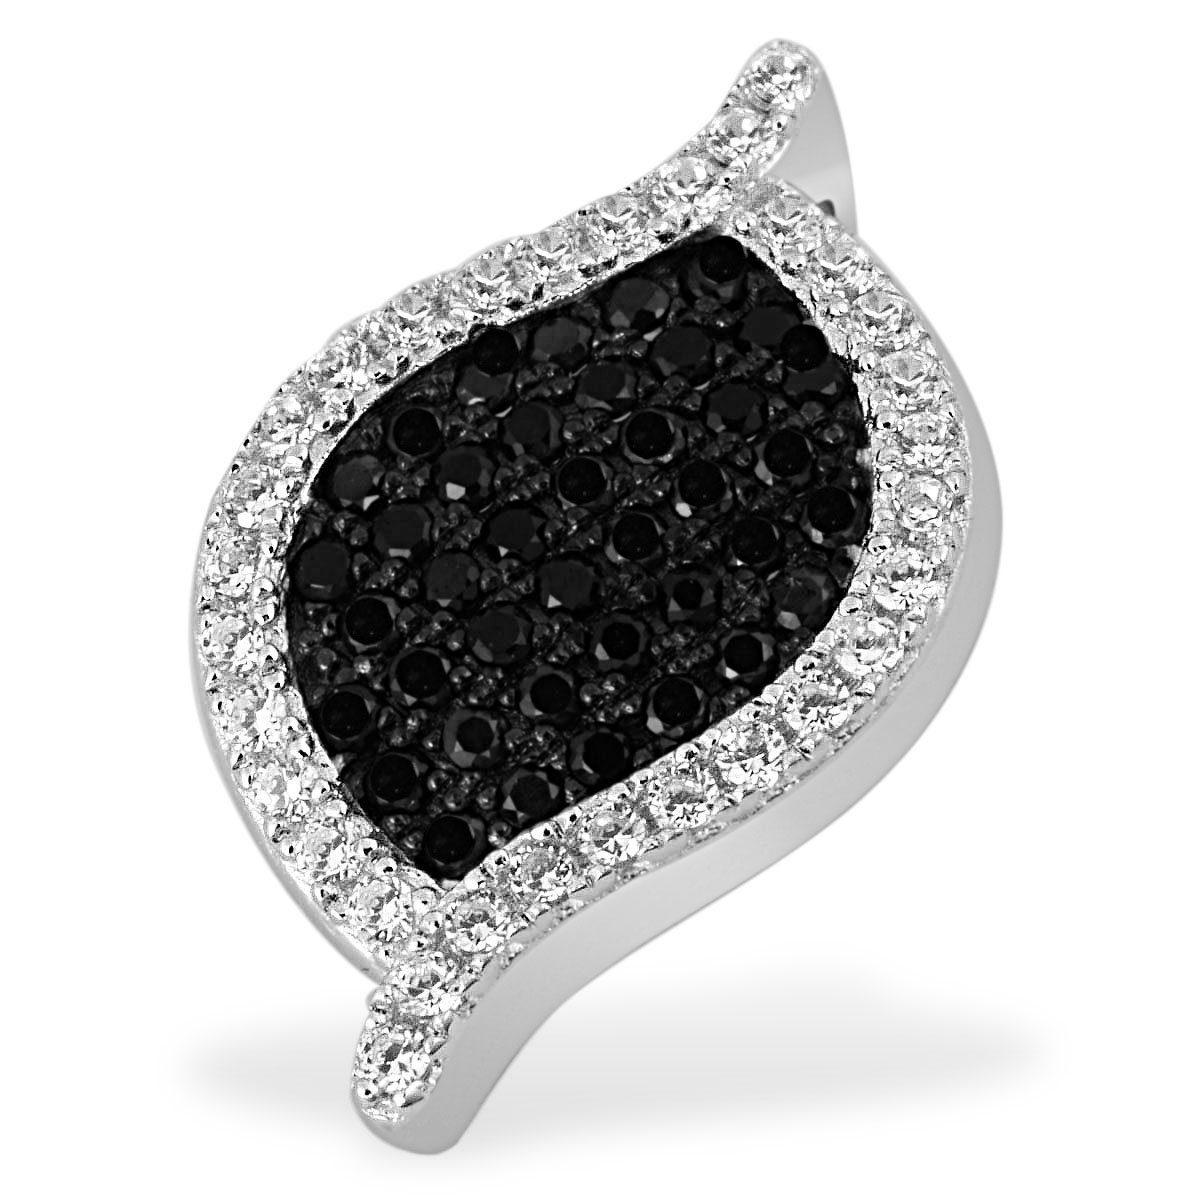 goldmaid Collier Black Pavee 925 Sterlingsilber 49 schwarz-weiße Zirkonia